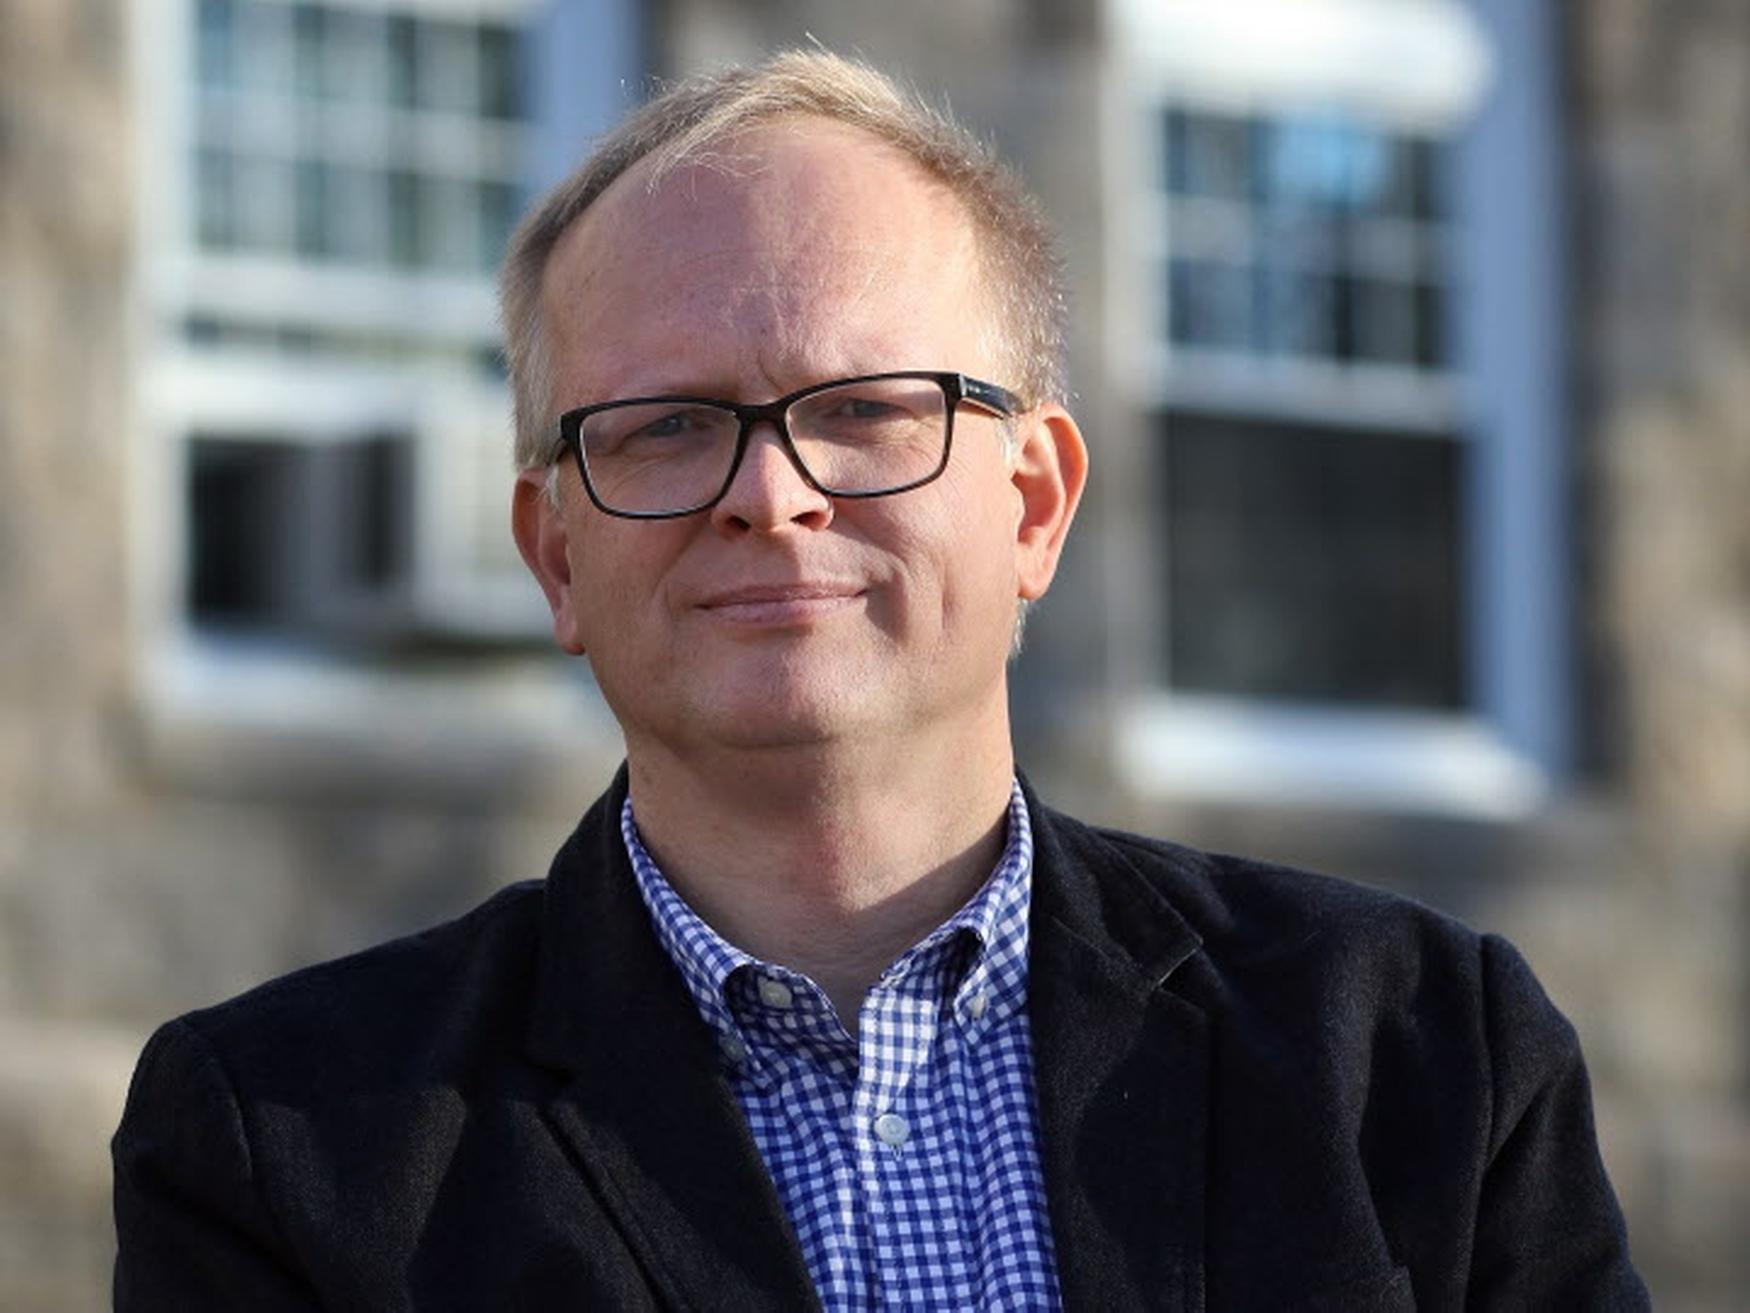 Professor Erik Loomis